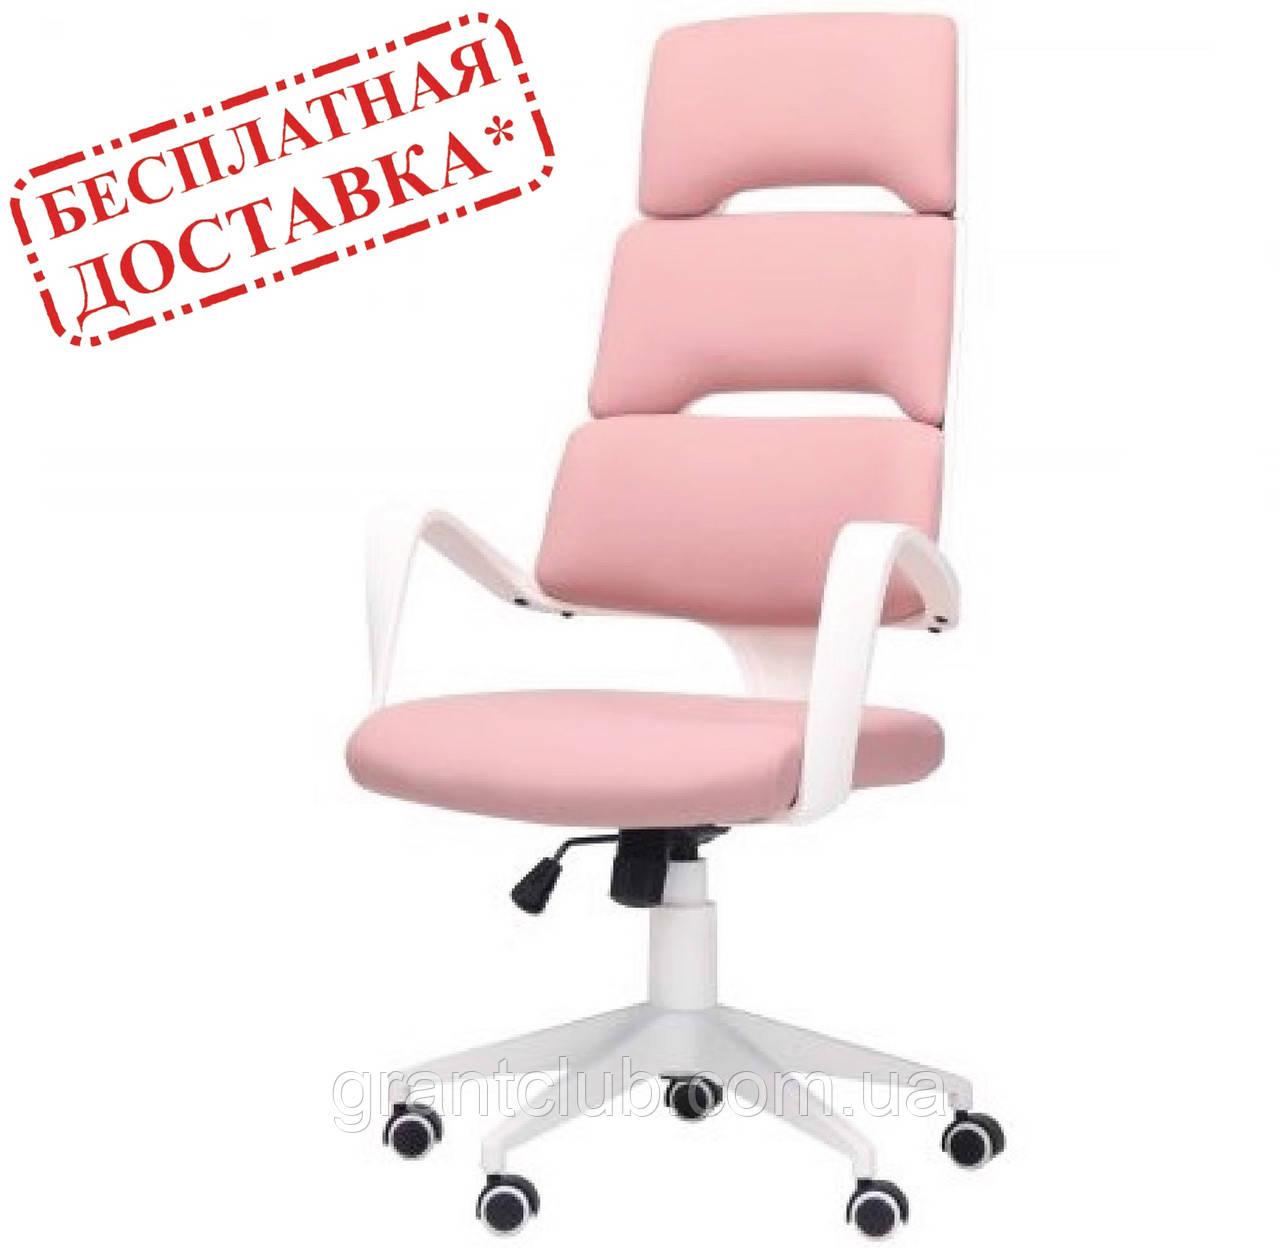 Кресло Spiral White Pink AMF (бесплатная доставка)